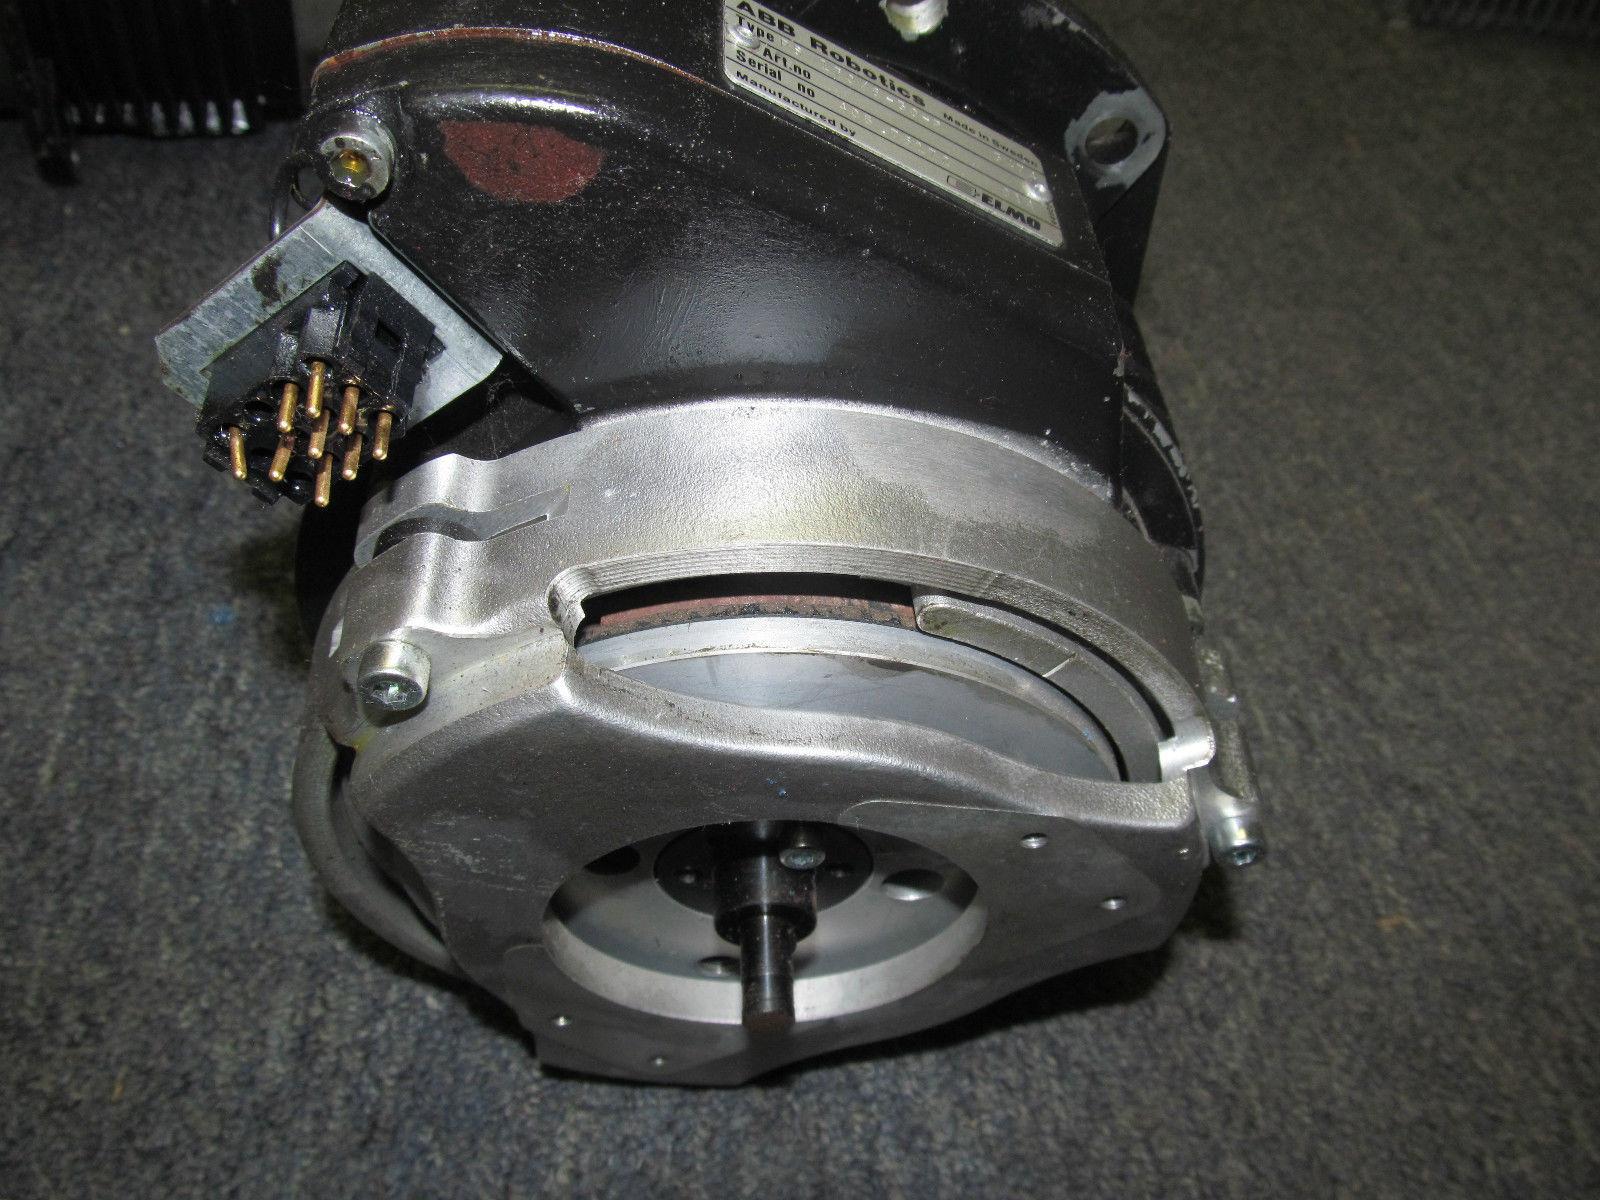 Used Abb Robotics Servo Motor Ps130 6 30 P 3474 Ebay